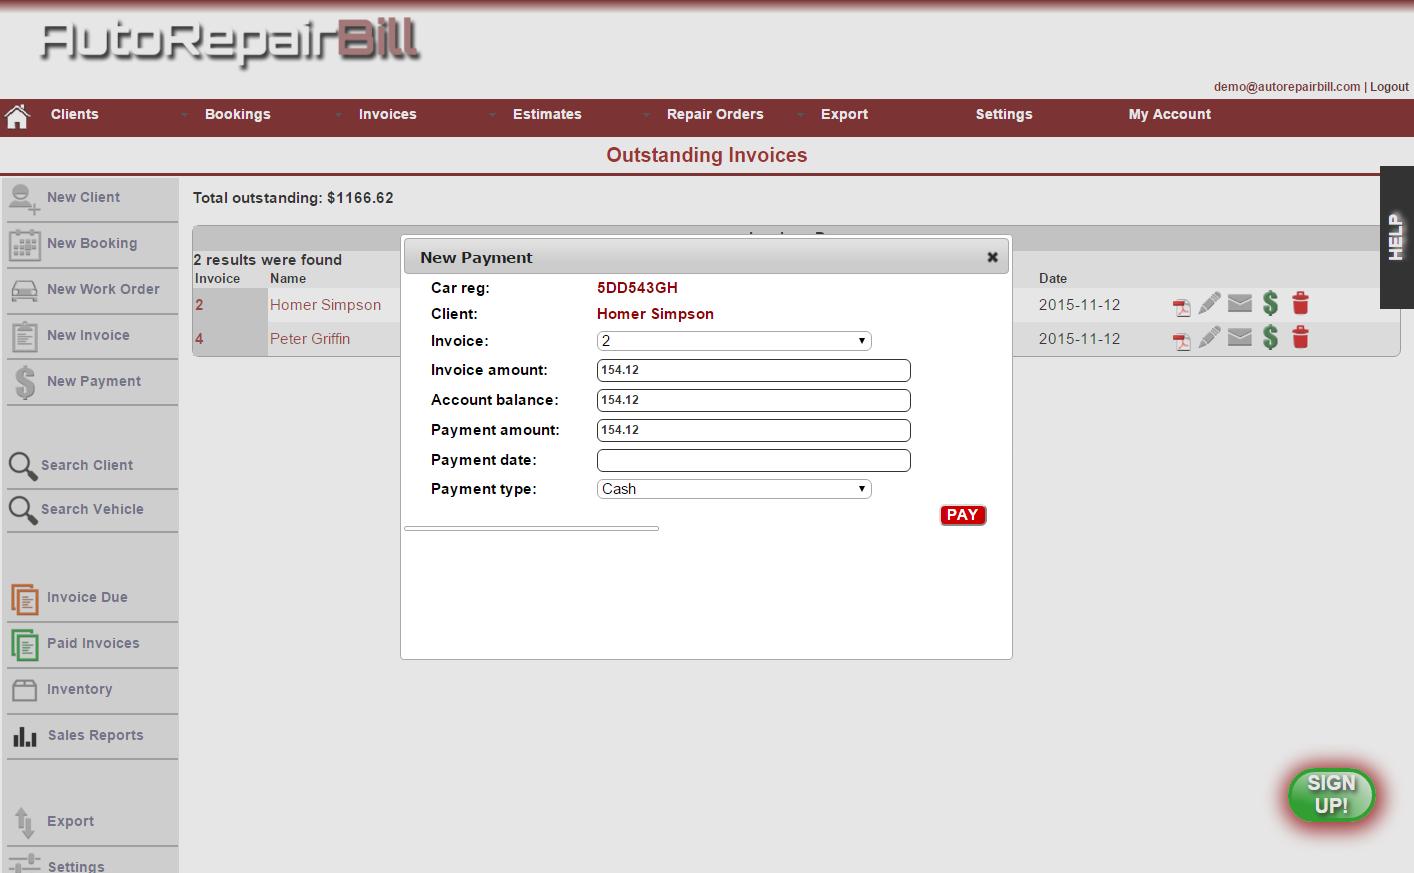 Auto Repair Software Easy Use Auto Repair Shop Software - Free auto repair shop invoice software for service business